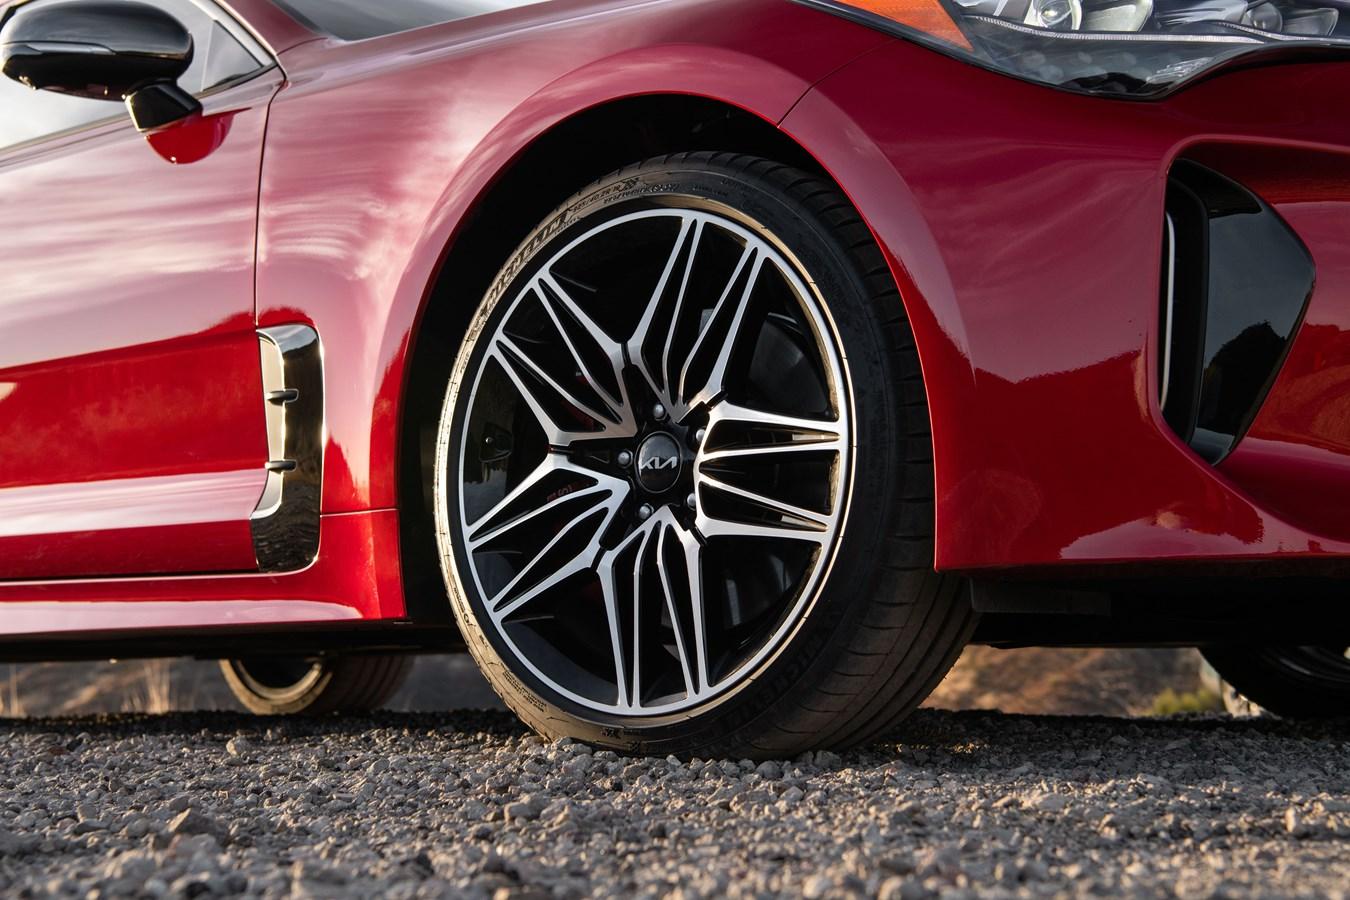 2022 Stinger GT front wheel detail